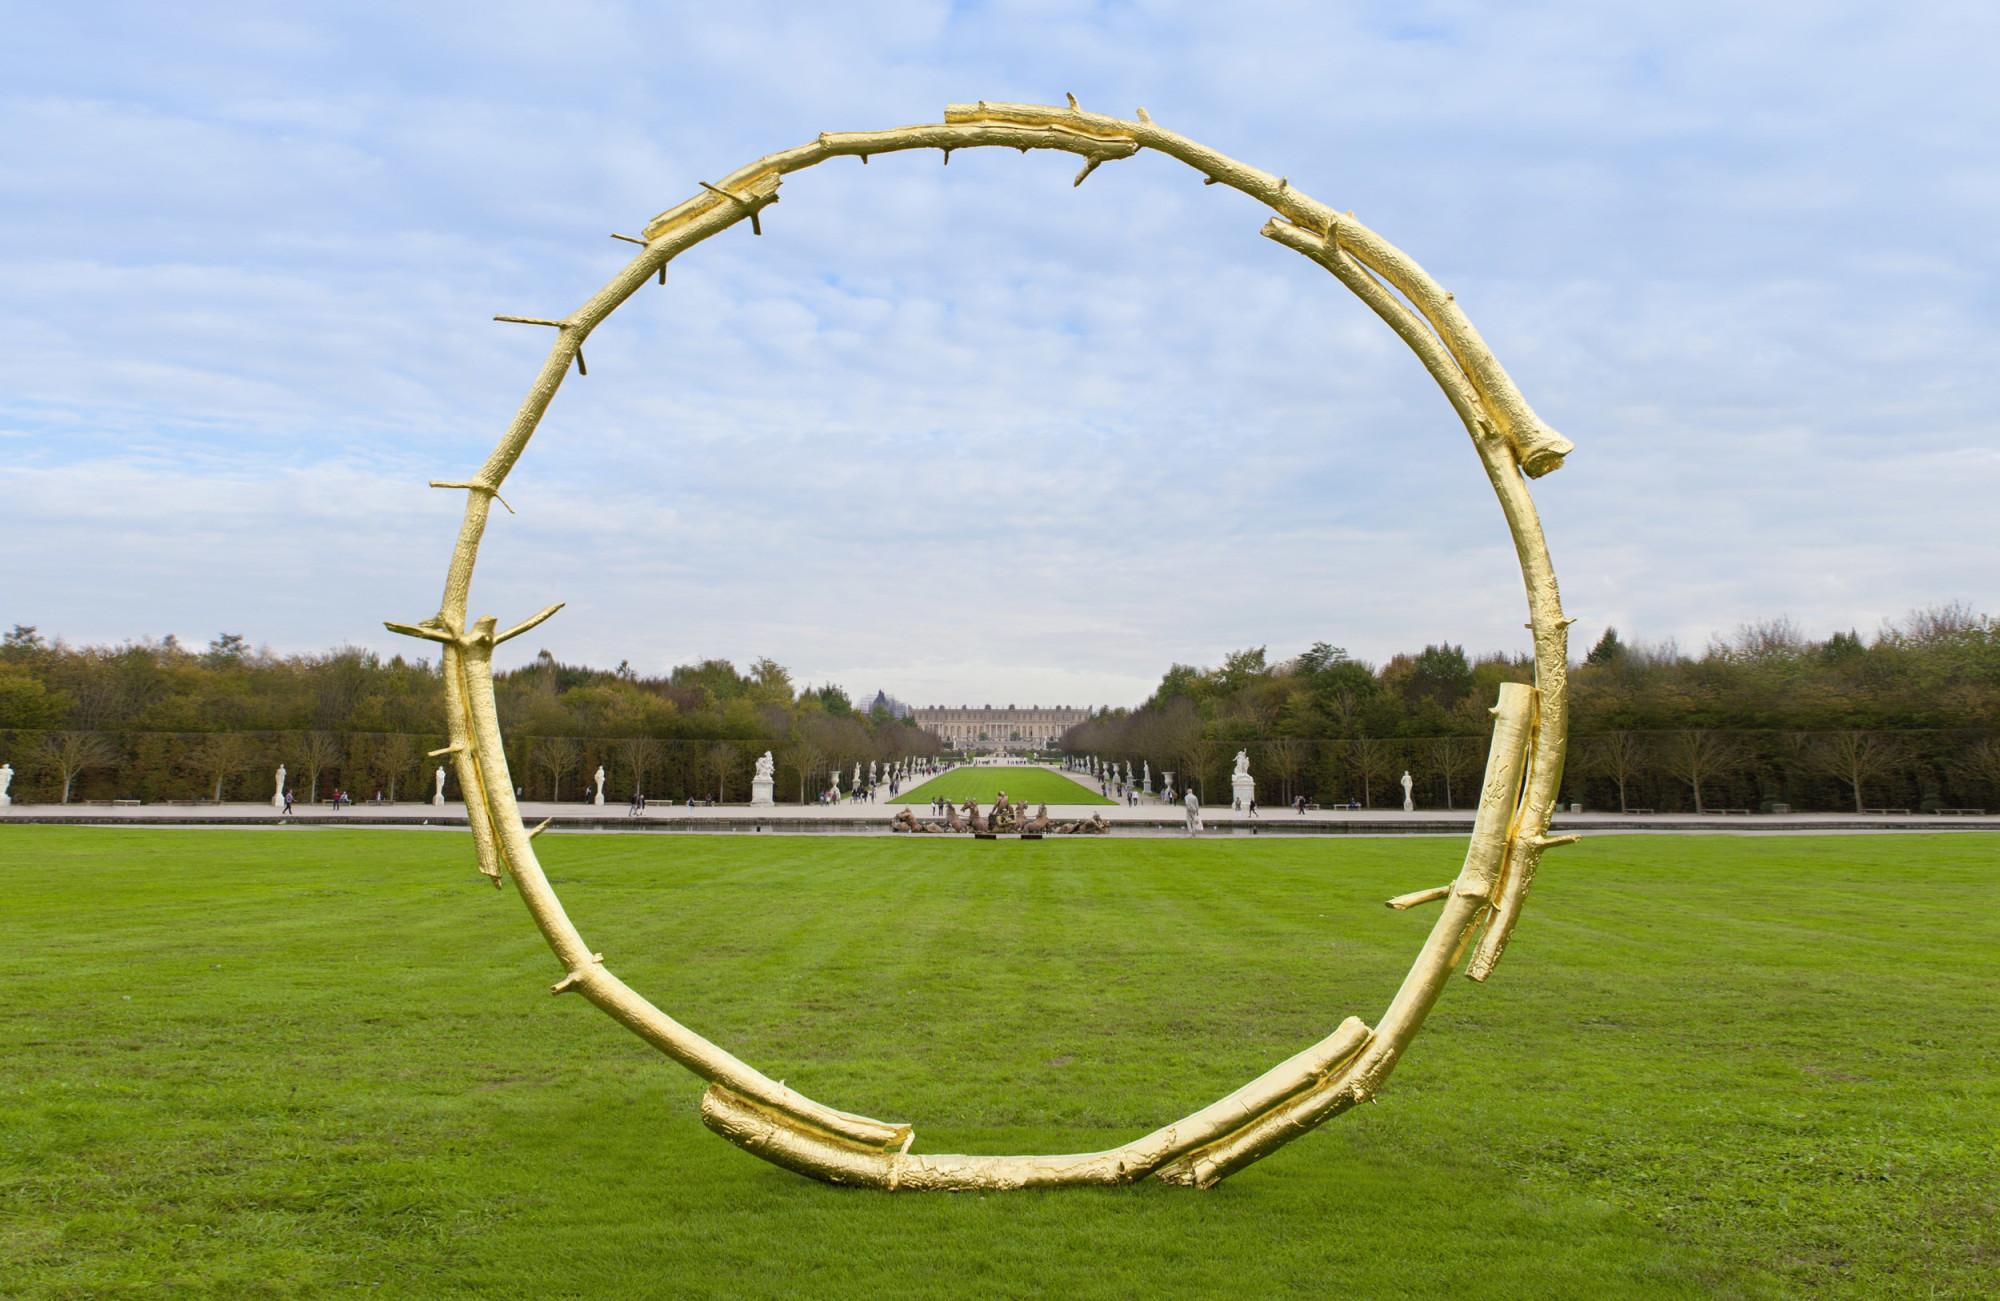 <p>Installation view, <em>The Sun</em>,Château de Versailles, Versailles, 22 October 2017 - 07 January 2018</p>